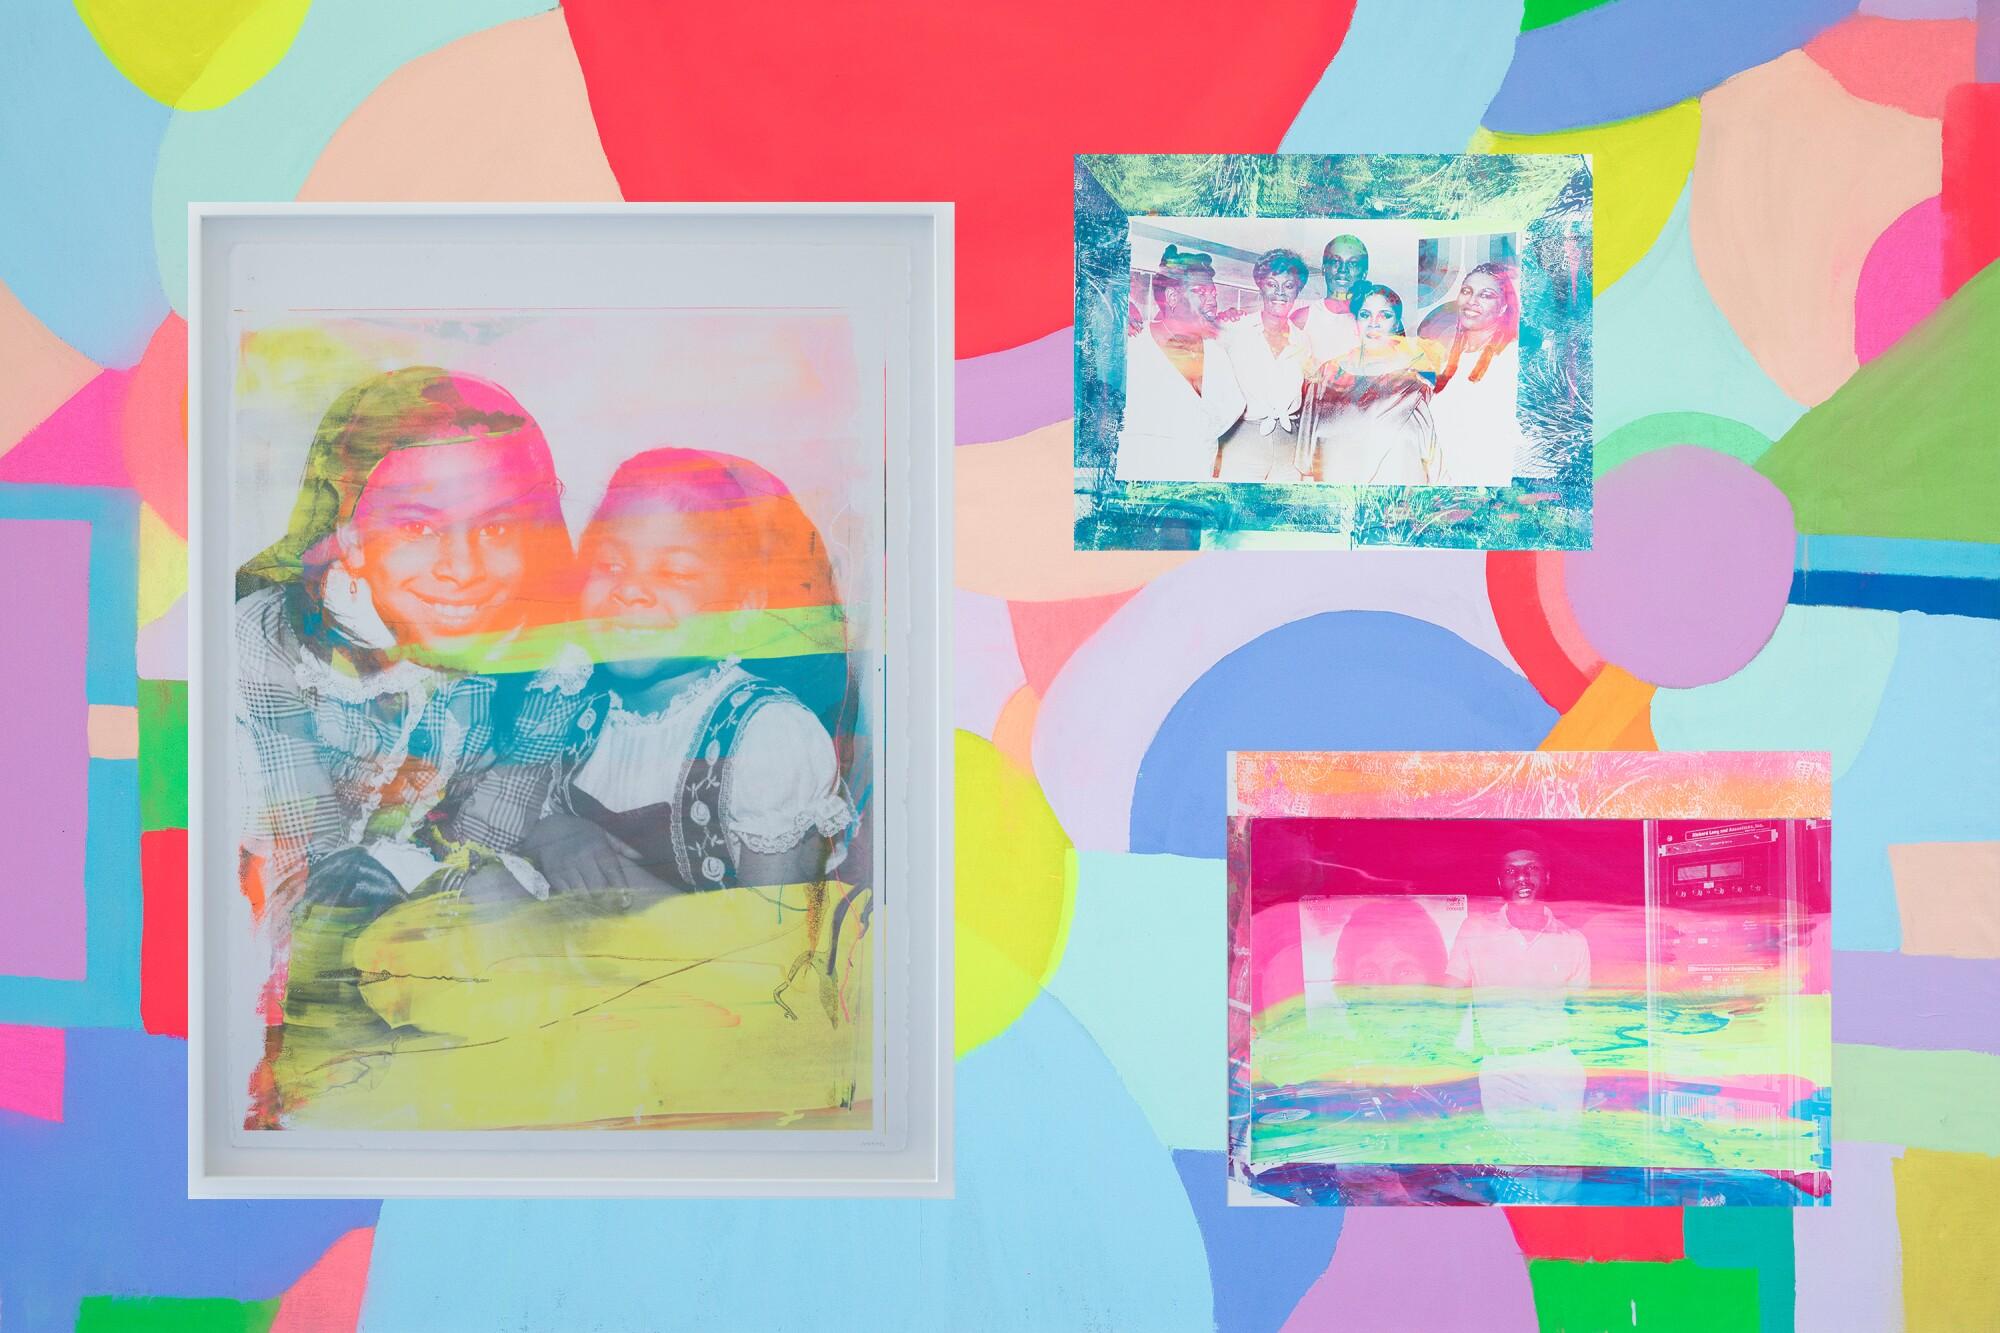 Three images of Adee Roberson's art.